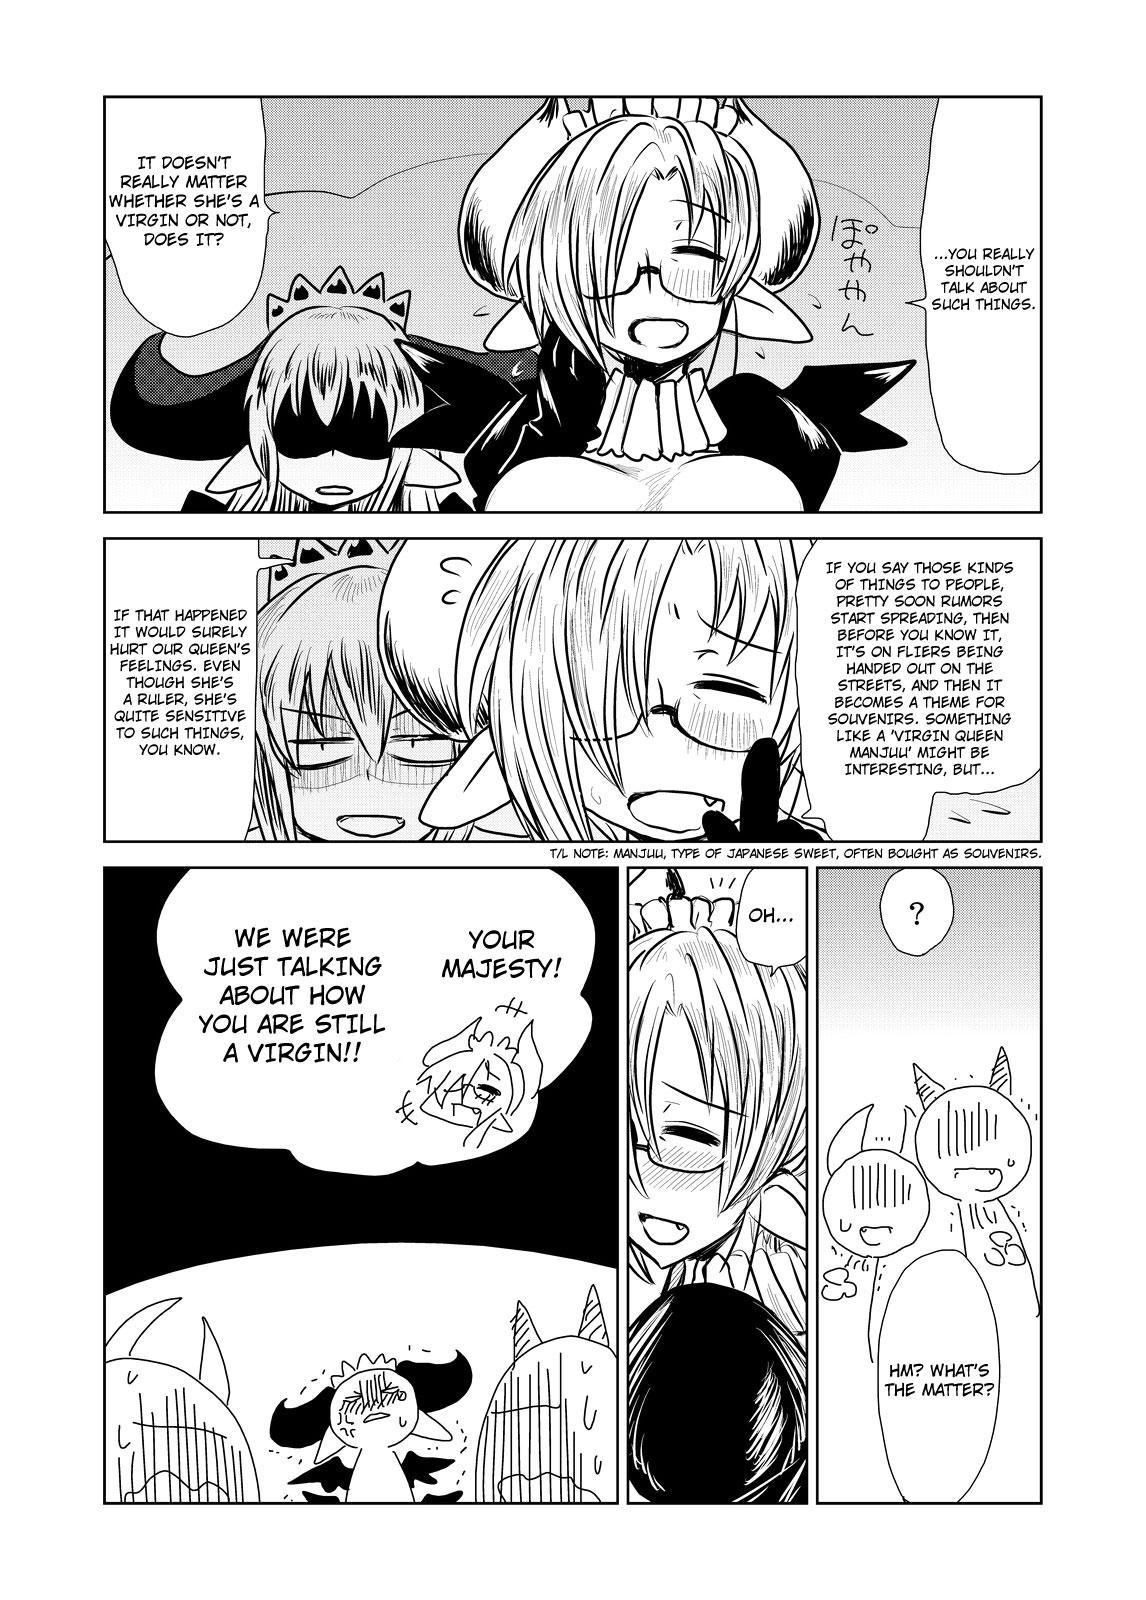 Toshima de, Maid de, Succubus de,   Middle aged, a Maid, and a Succubus 2